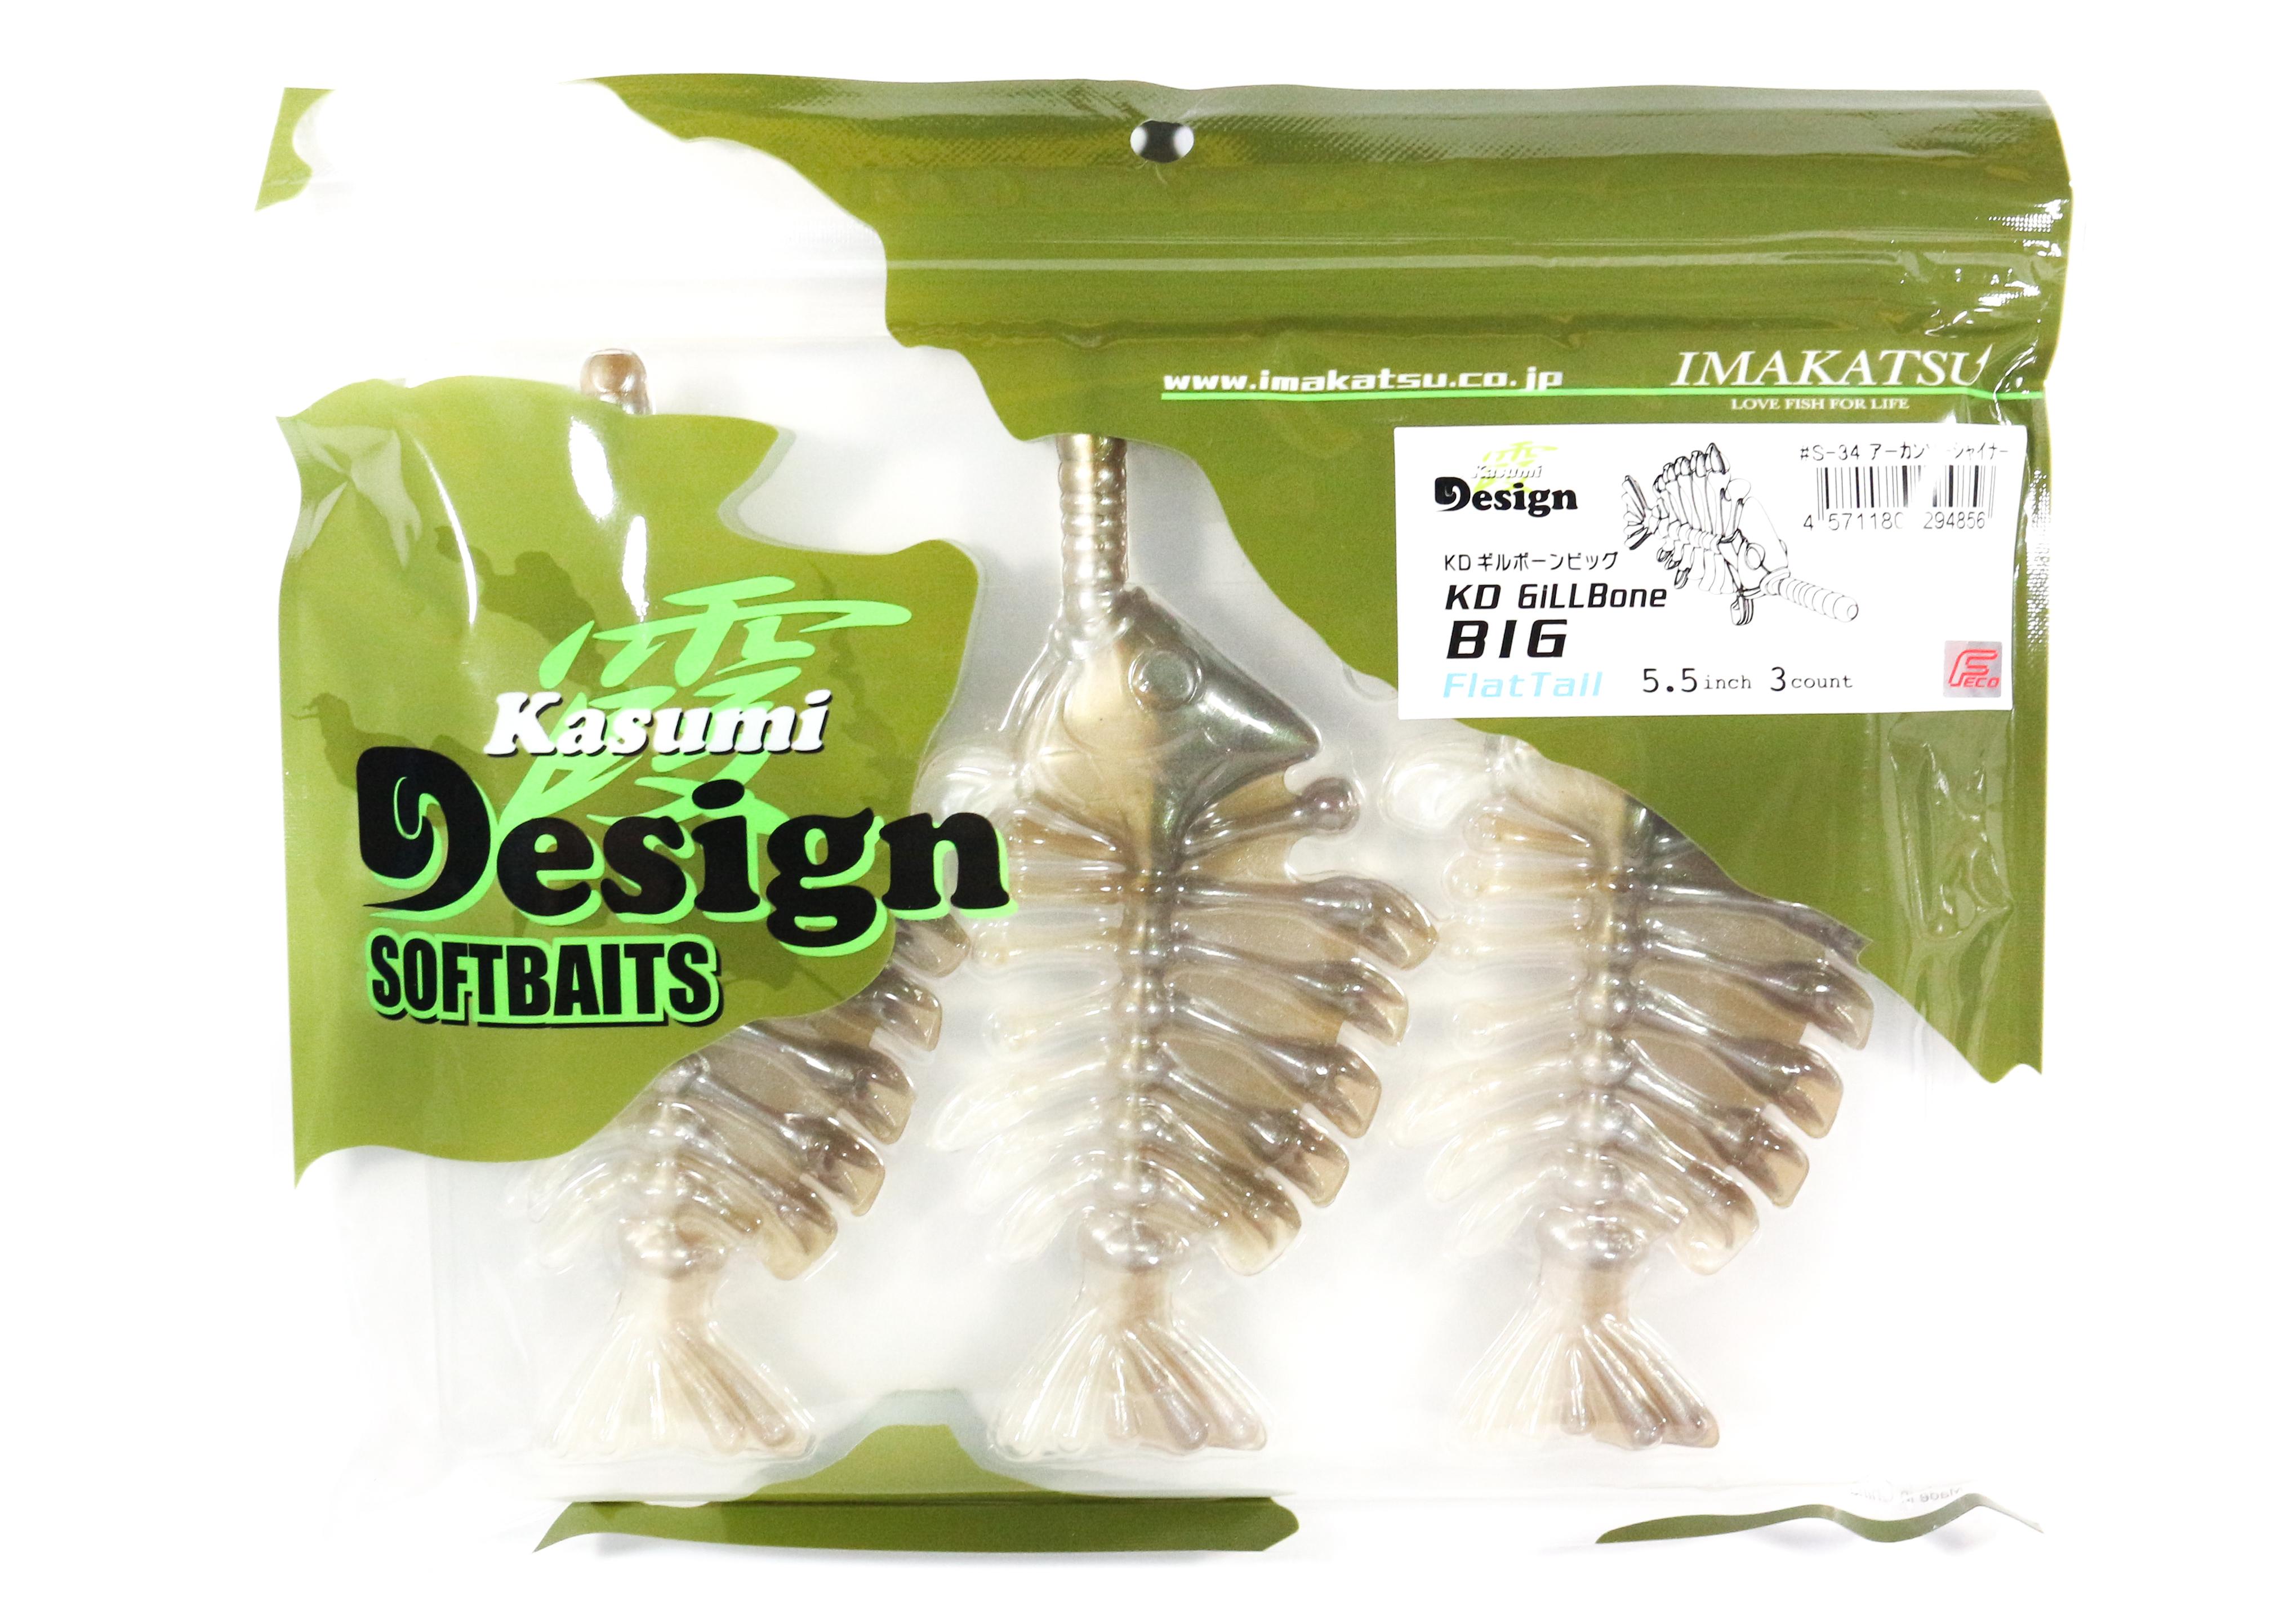 Sale Imakatsu Soft Lure Gill Bone Big Flat Tail 5.5 Inches S-34 (4856)